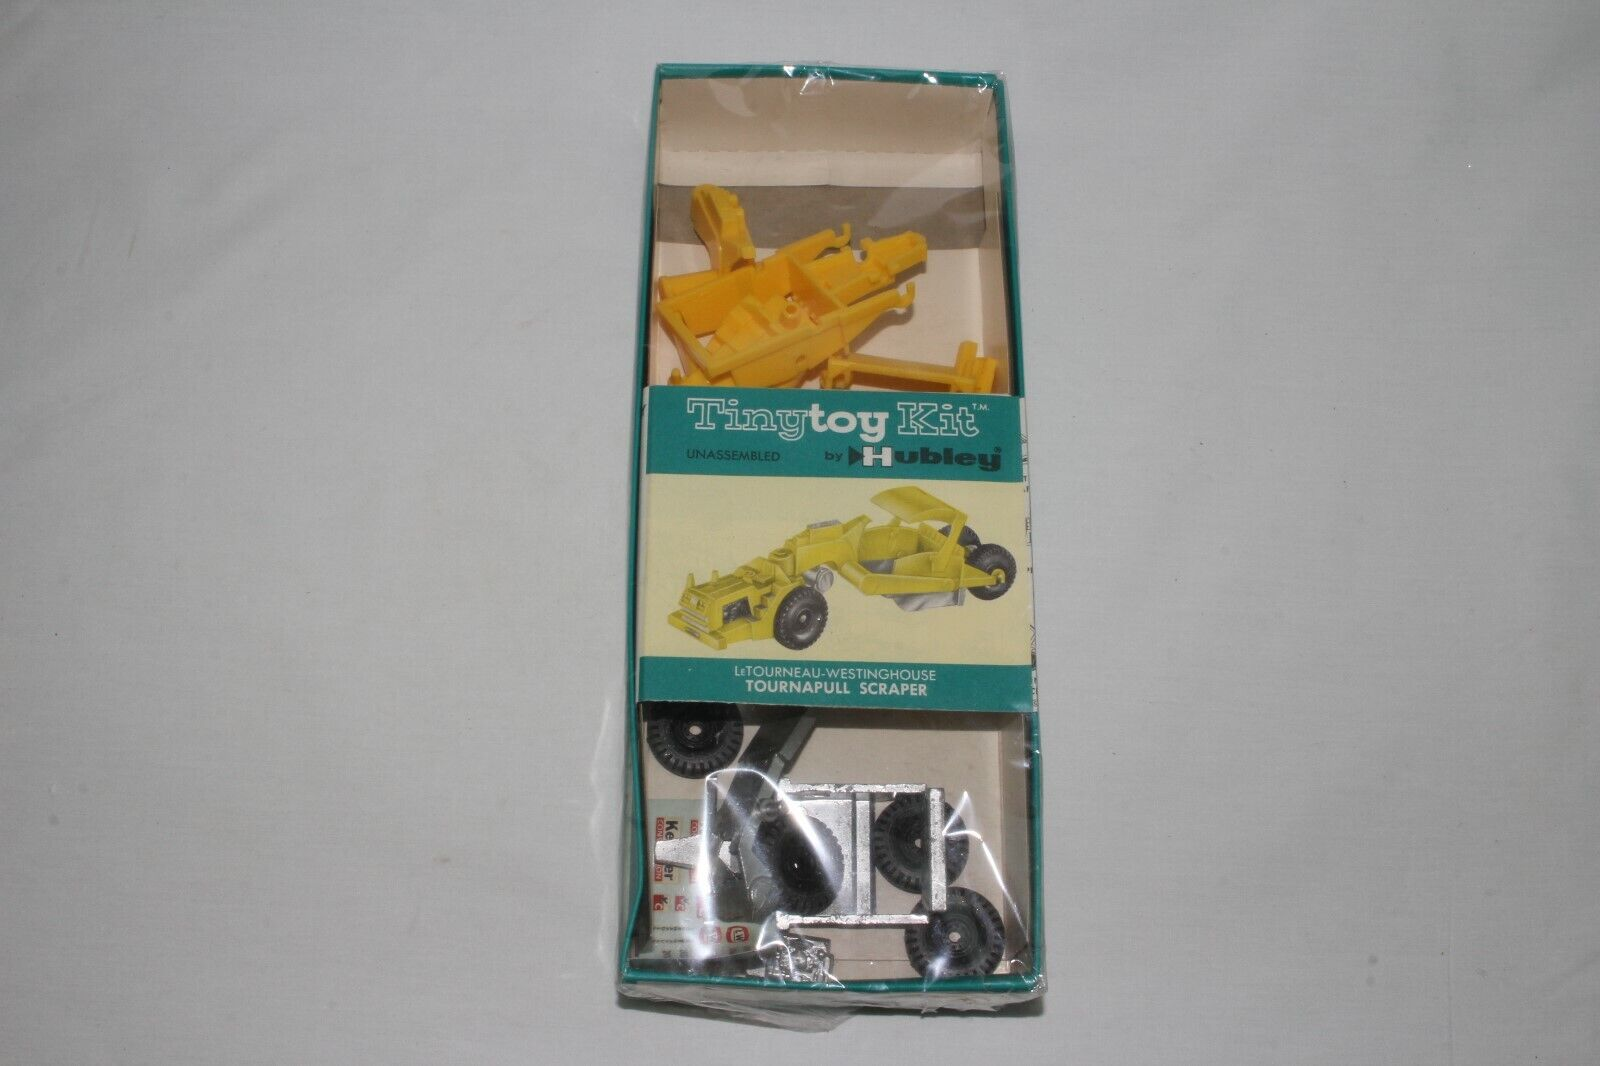 1960's Hubley Tiny Modèle Jouet Kit,Westinghouse Tournapull Grattoir Nice